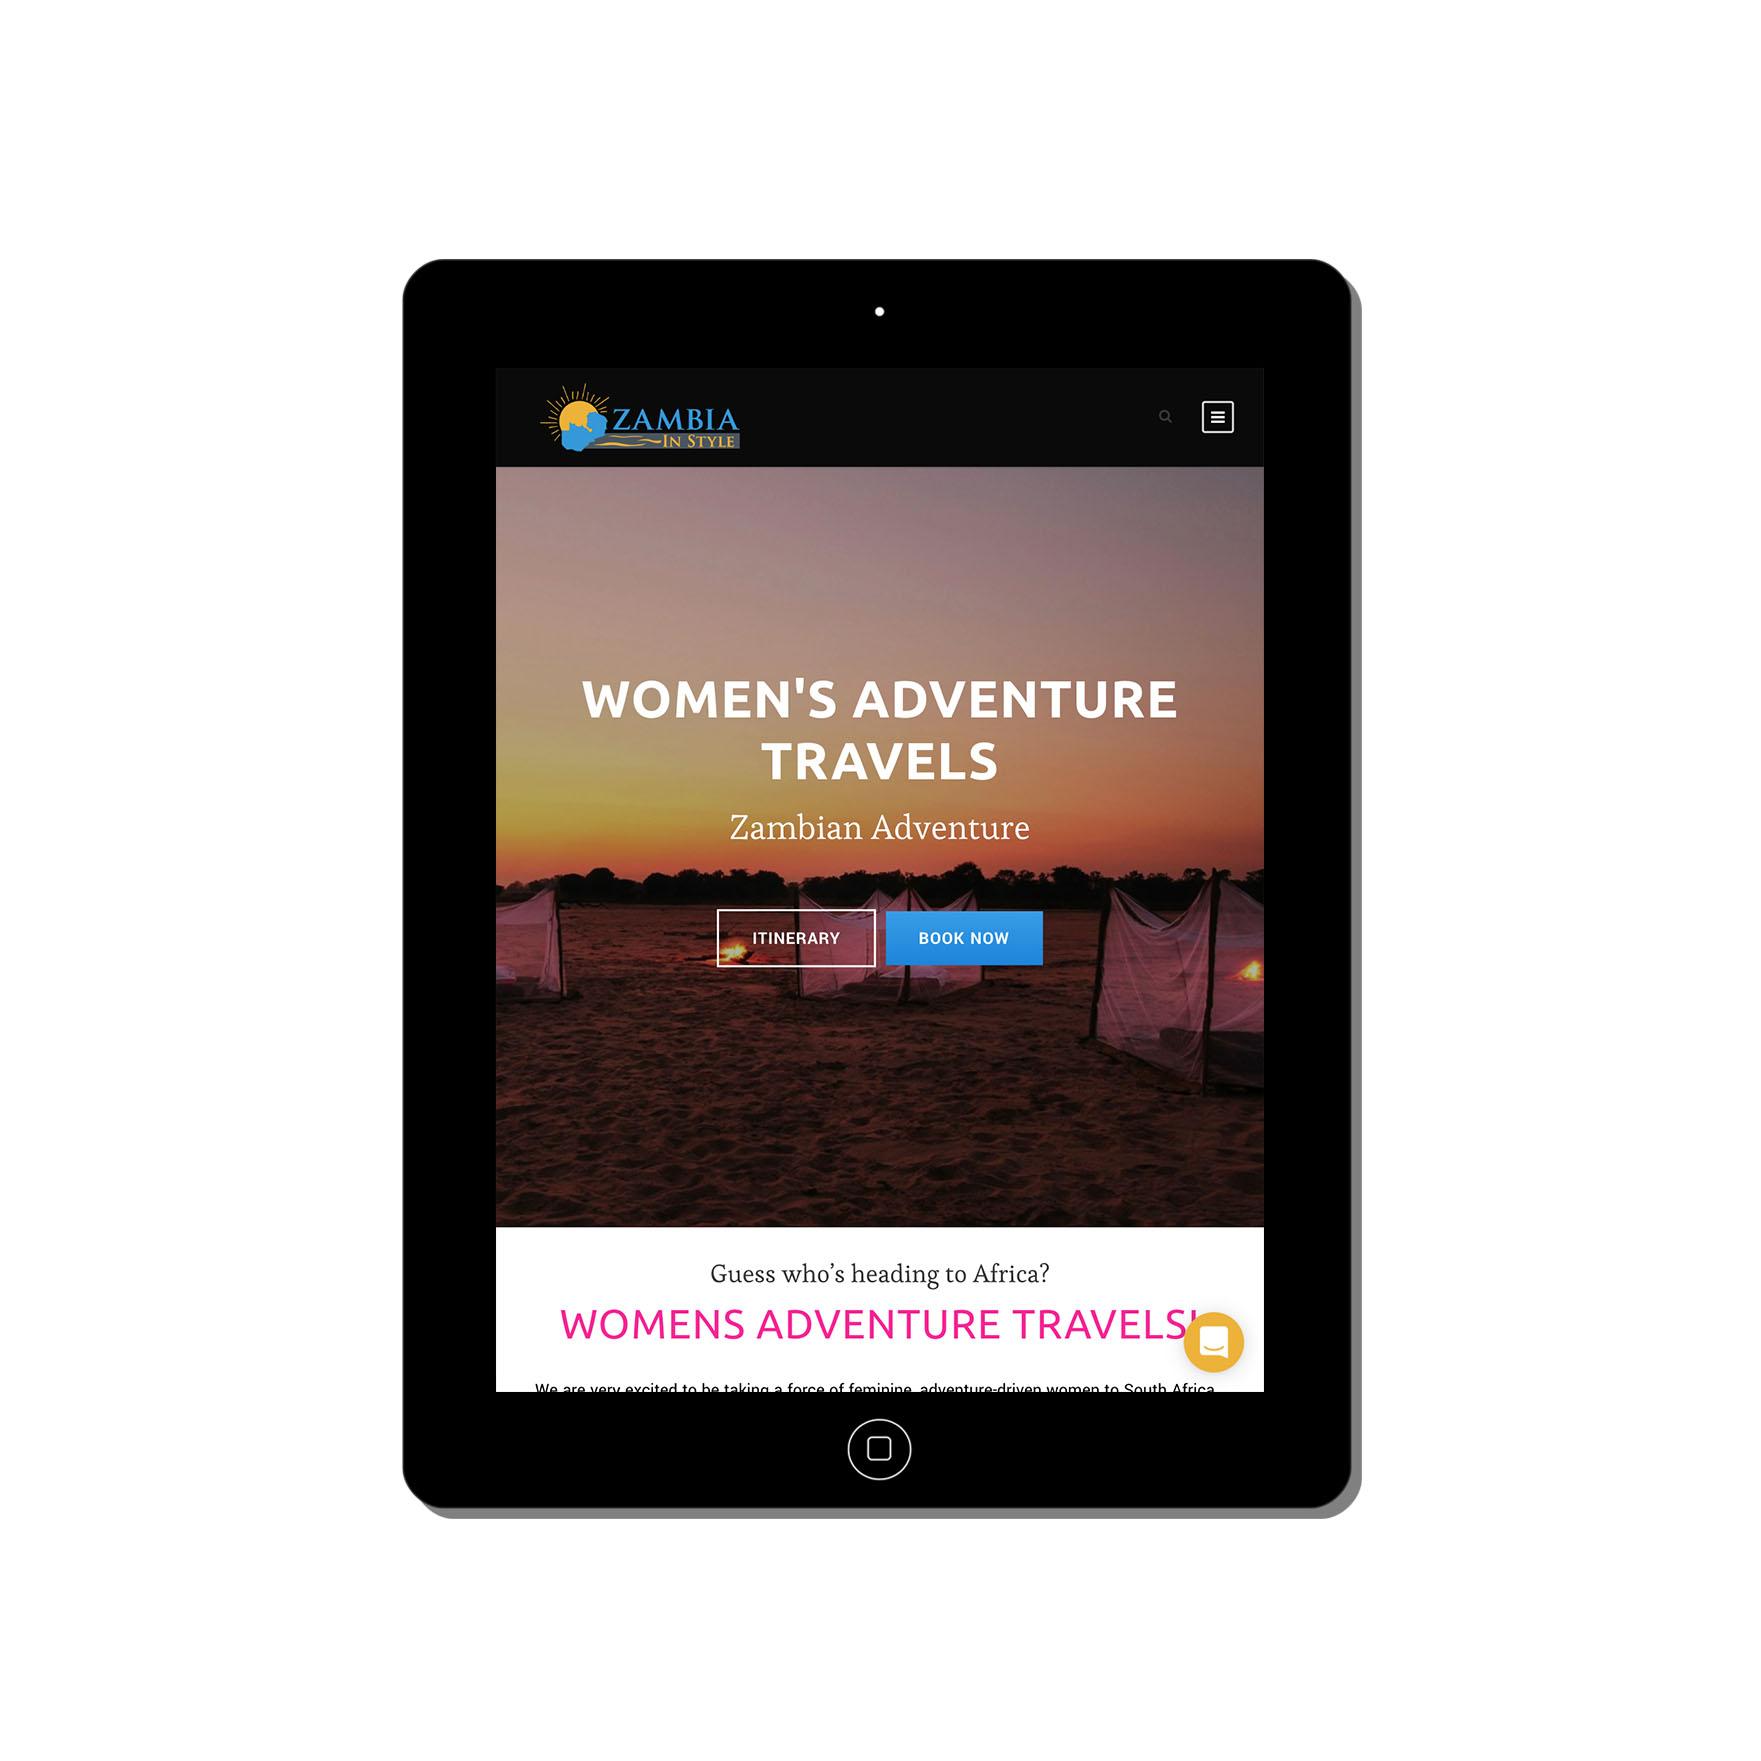 zambia in style web-design-portfolio-webdoor-responsive-web-design-agency-hillcrest-kwazulu-natal-tablet